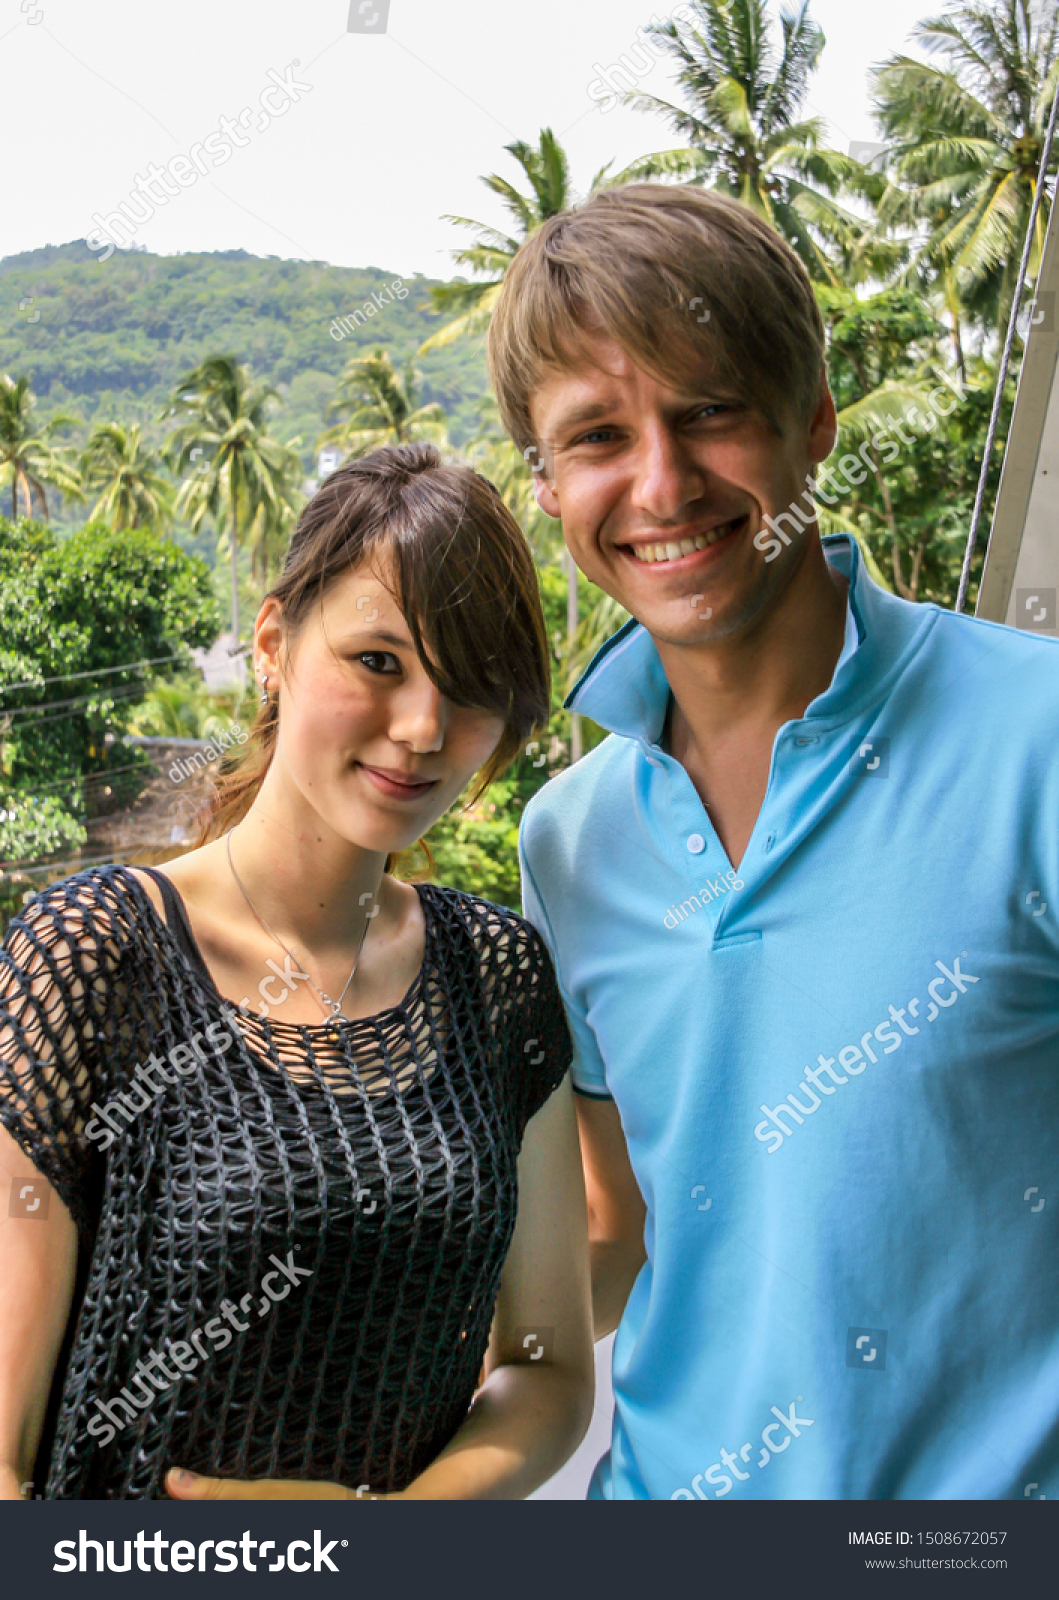 dating în phuket thailanda